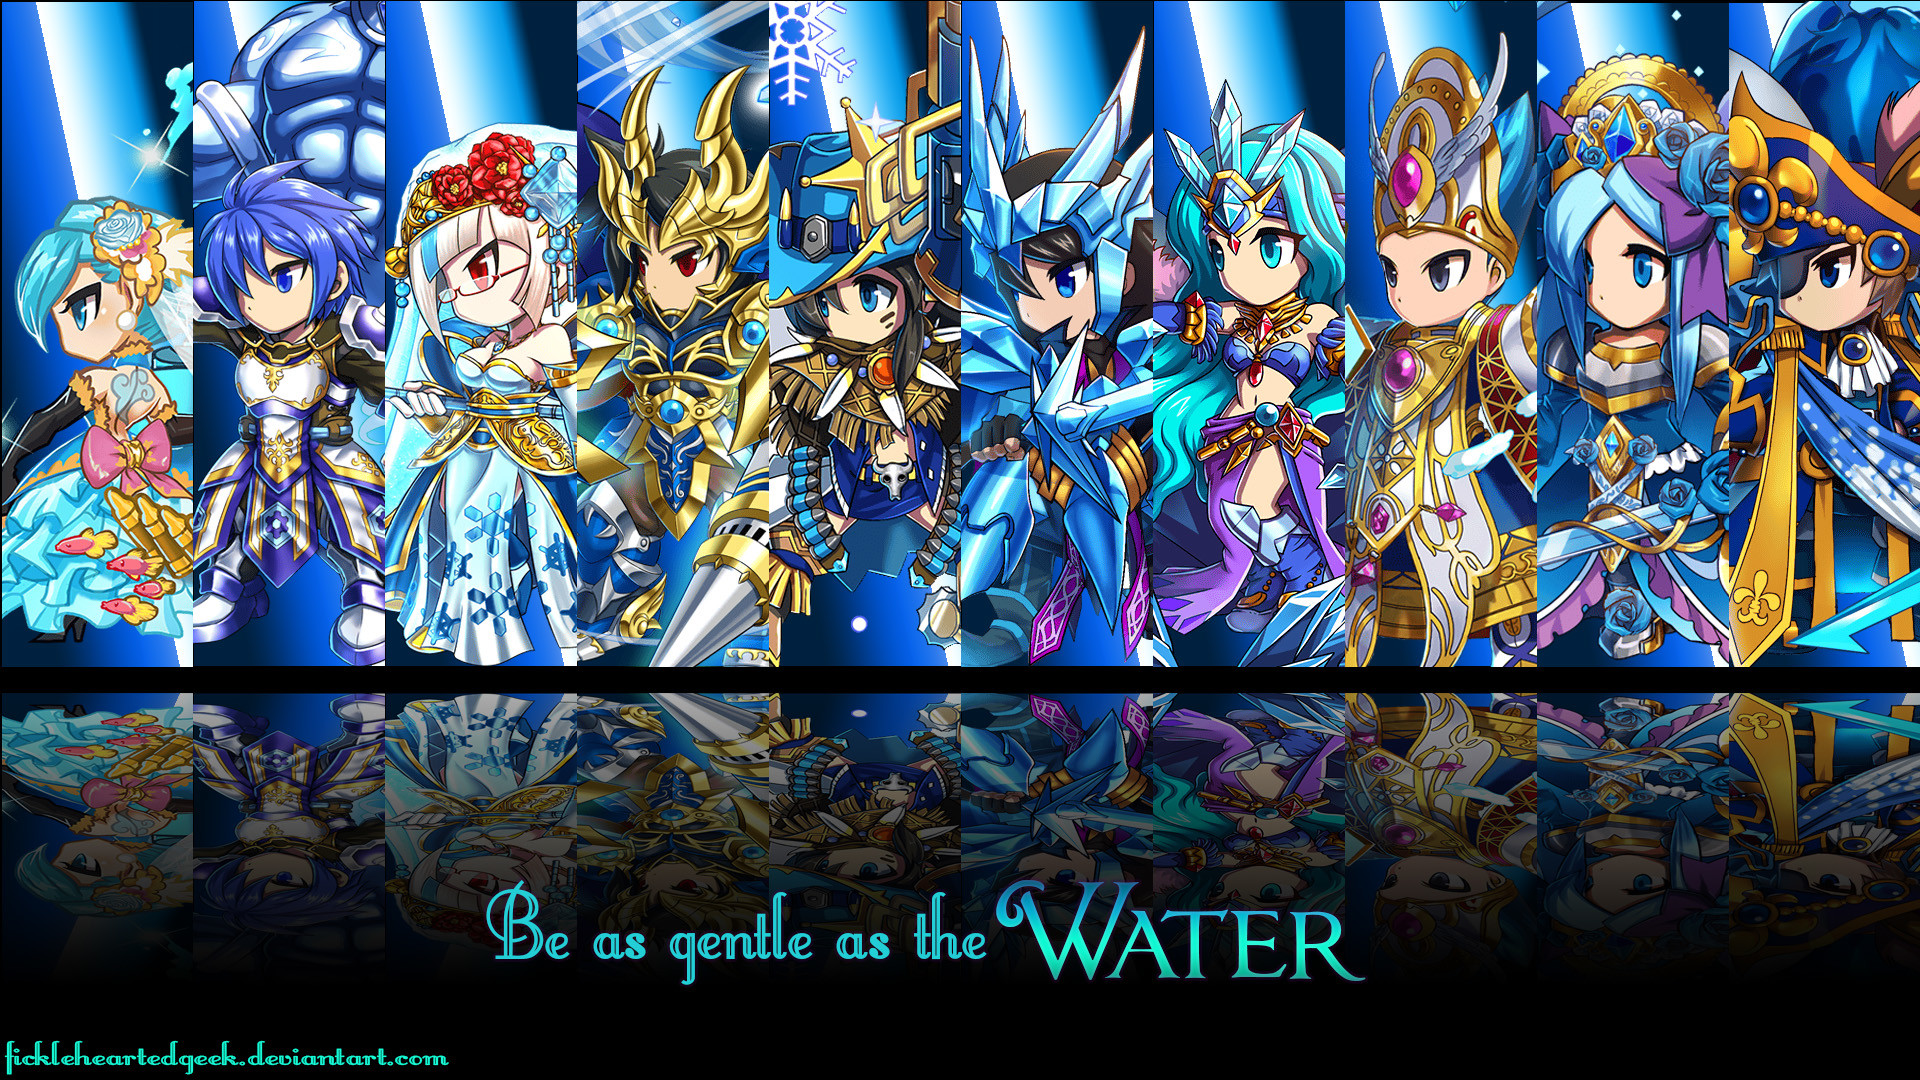 Download Kikuri Brave Frontier 6 Star Brave frontier water units